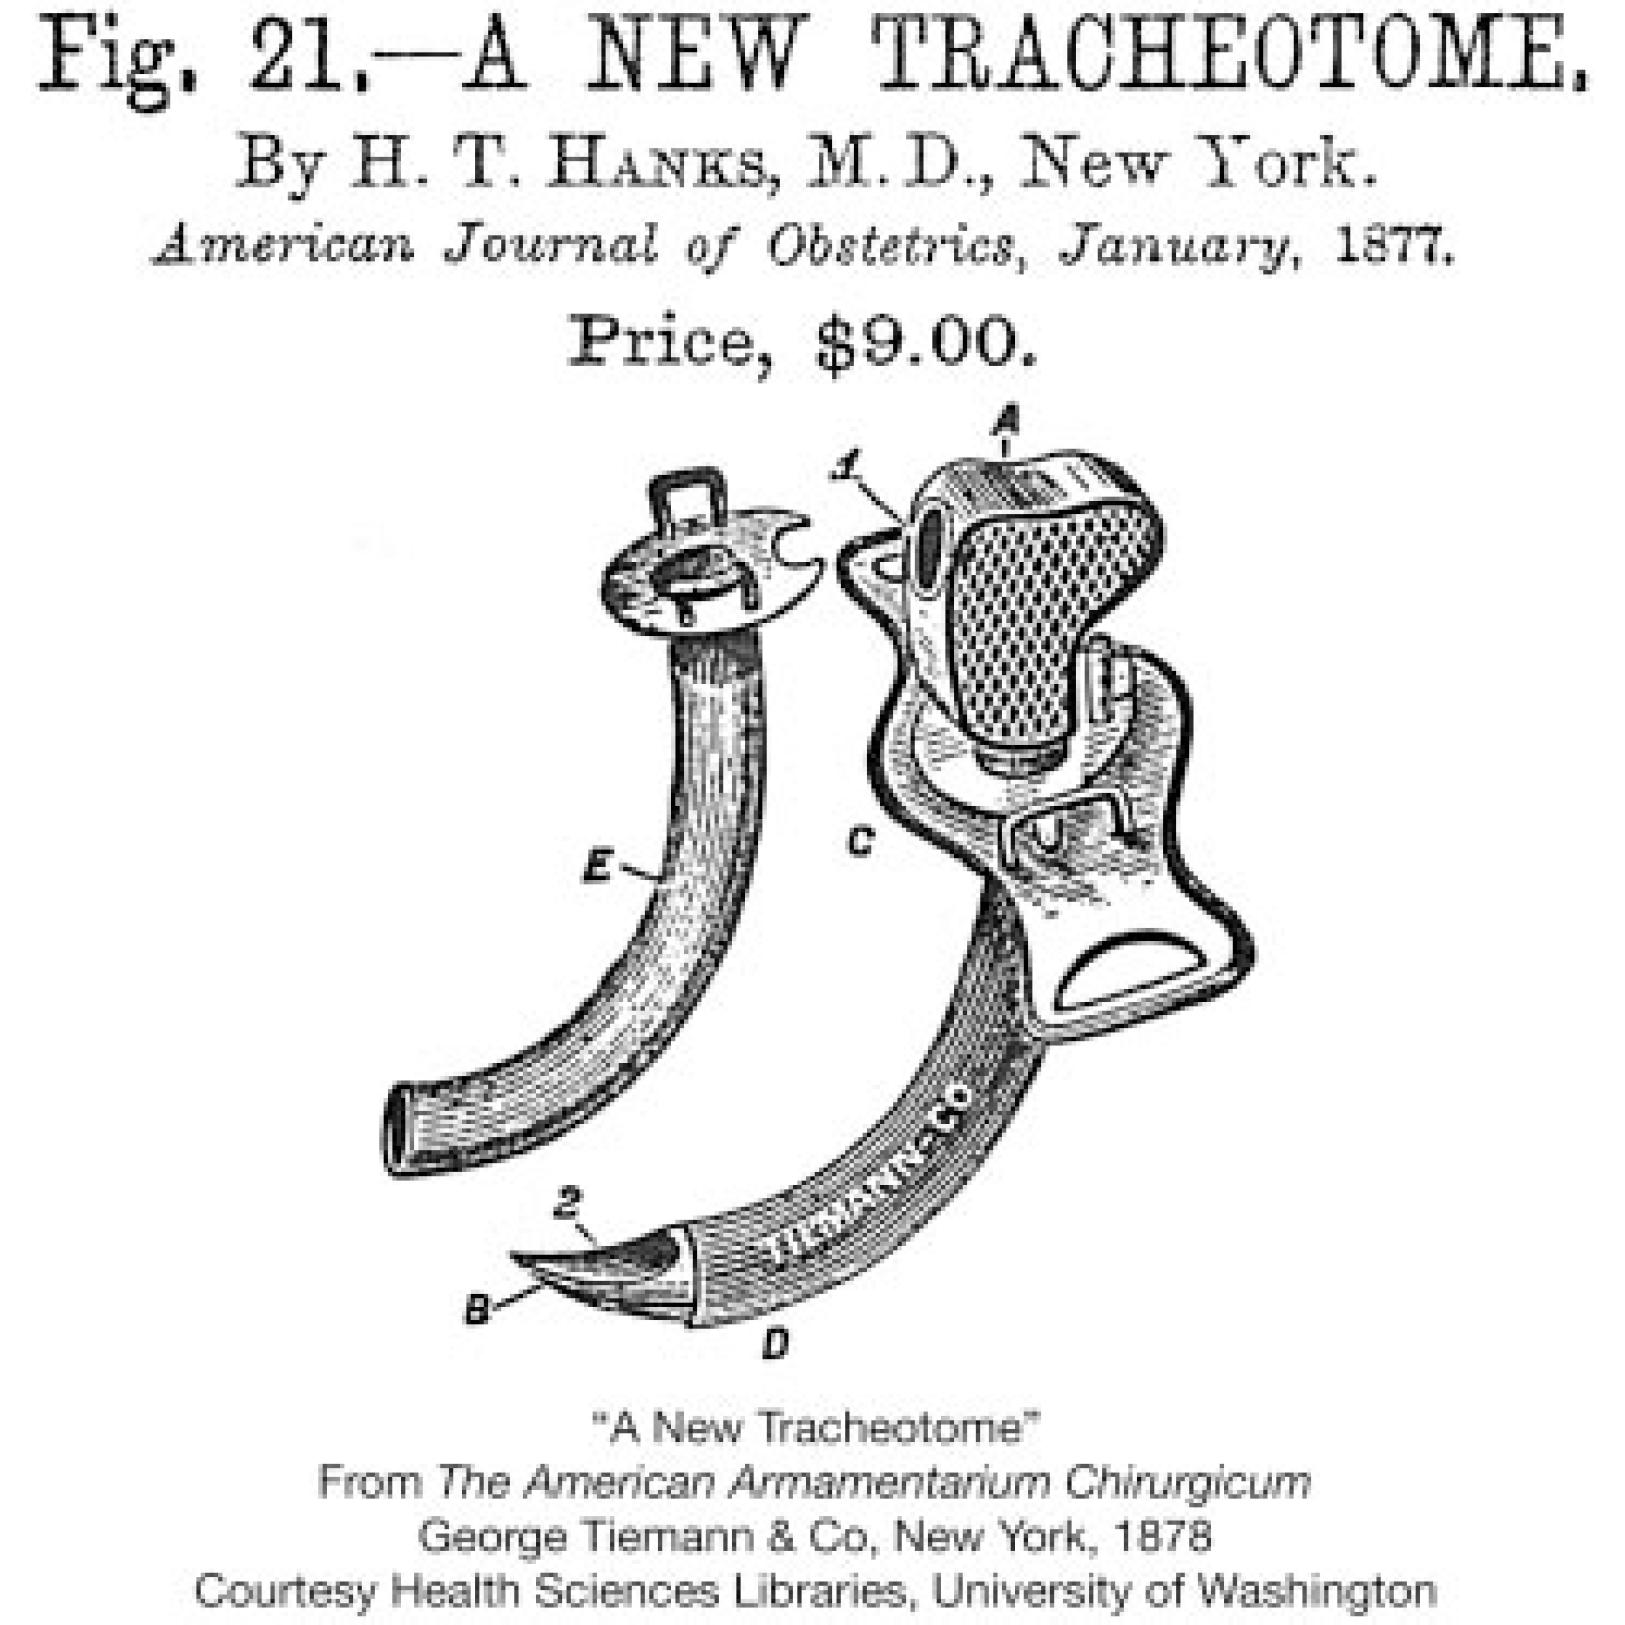 A new tracheotome. (1878).  The American Armamentarium Chirugicum. Washington : Health Science Libraries.